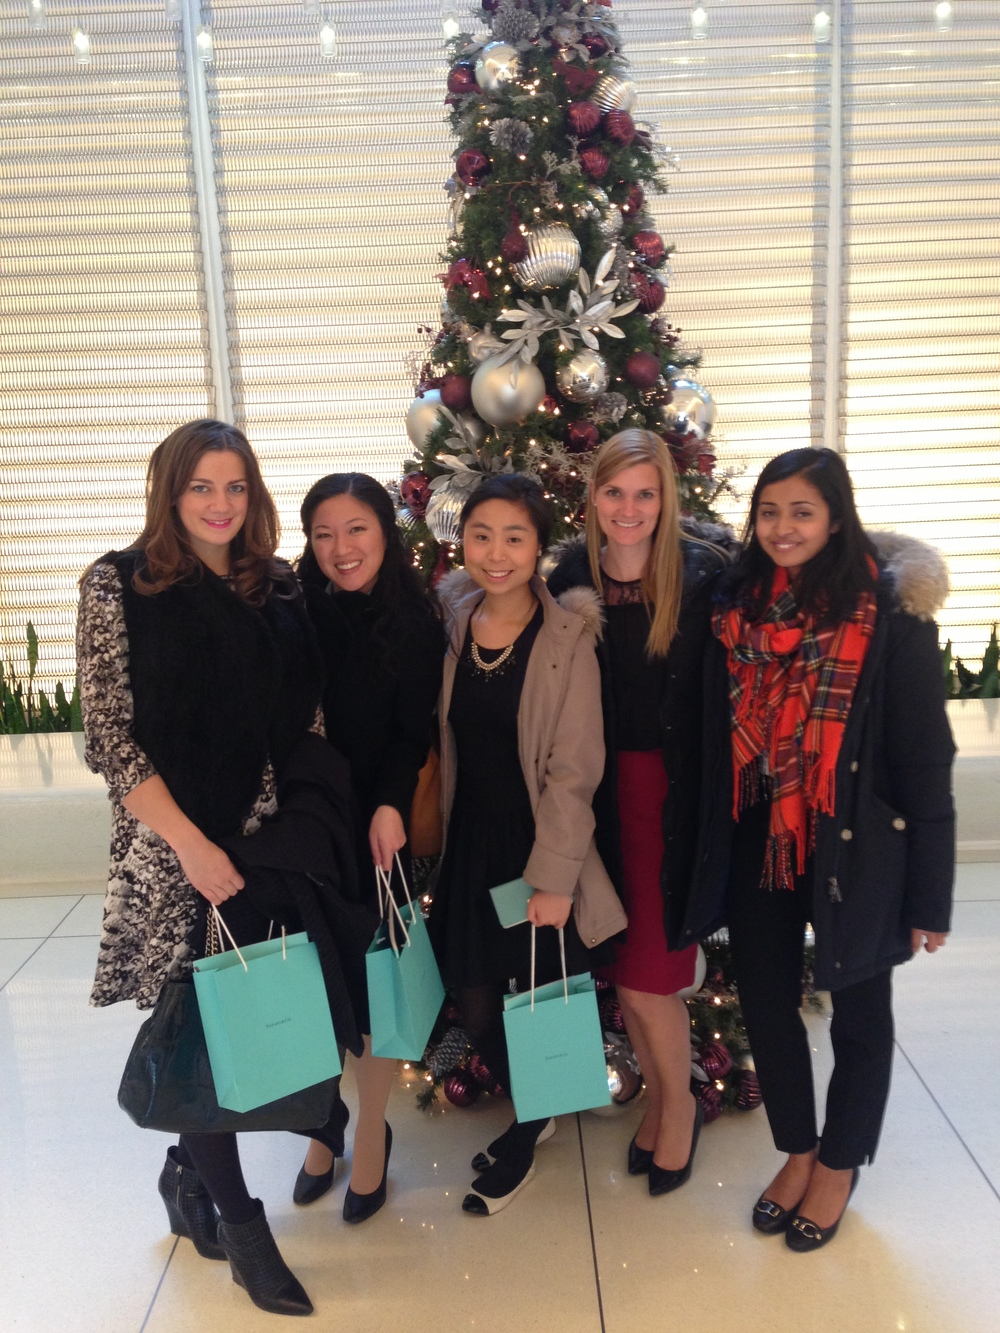 @ Tiffany & Co. (from L to R) Sarah Jahnke, Andi Hadisupjipto, Sana Suh, Julie Hasiba, Faria Jabbar.